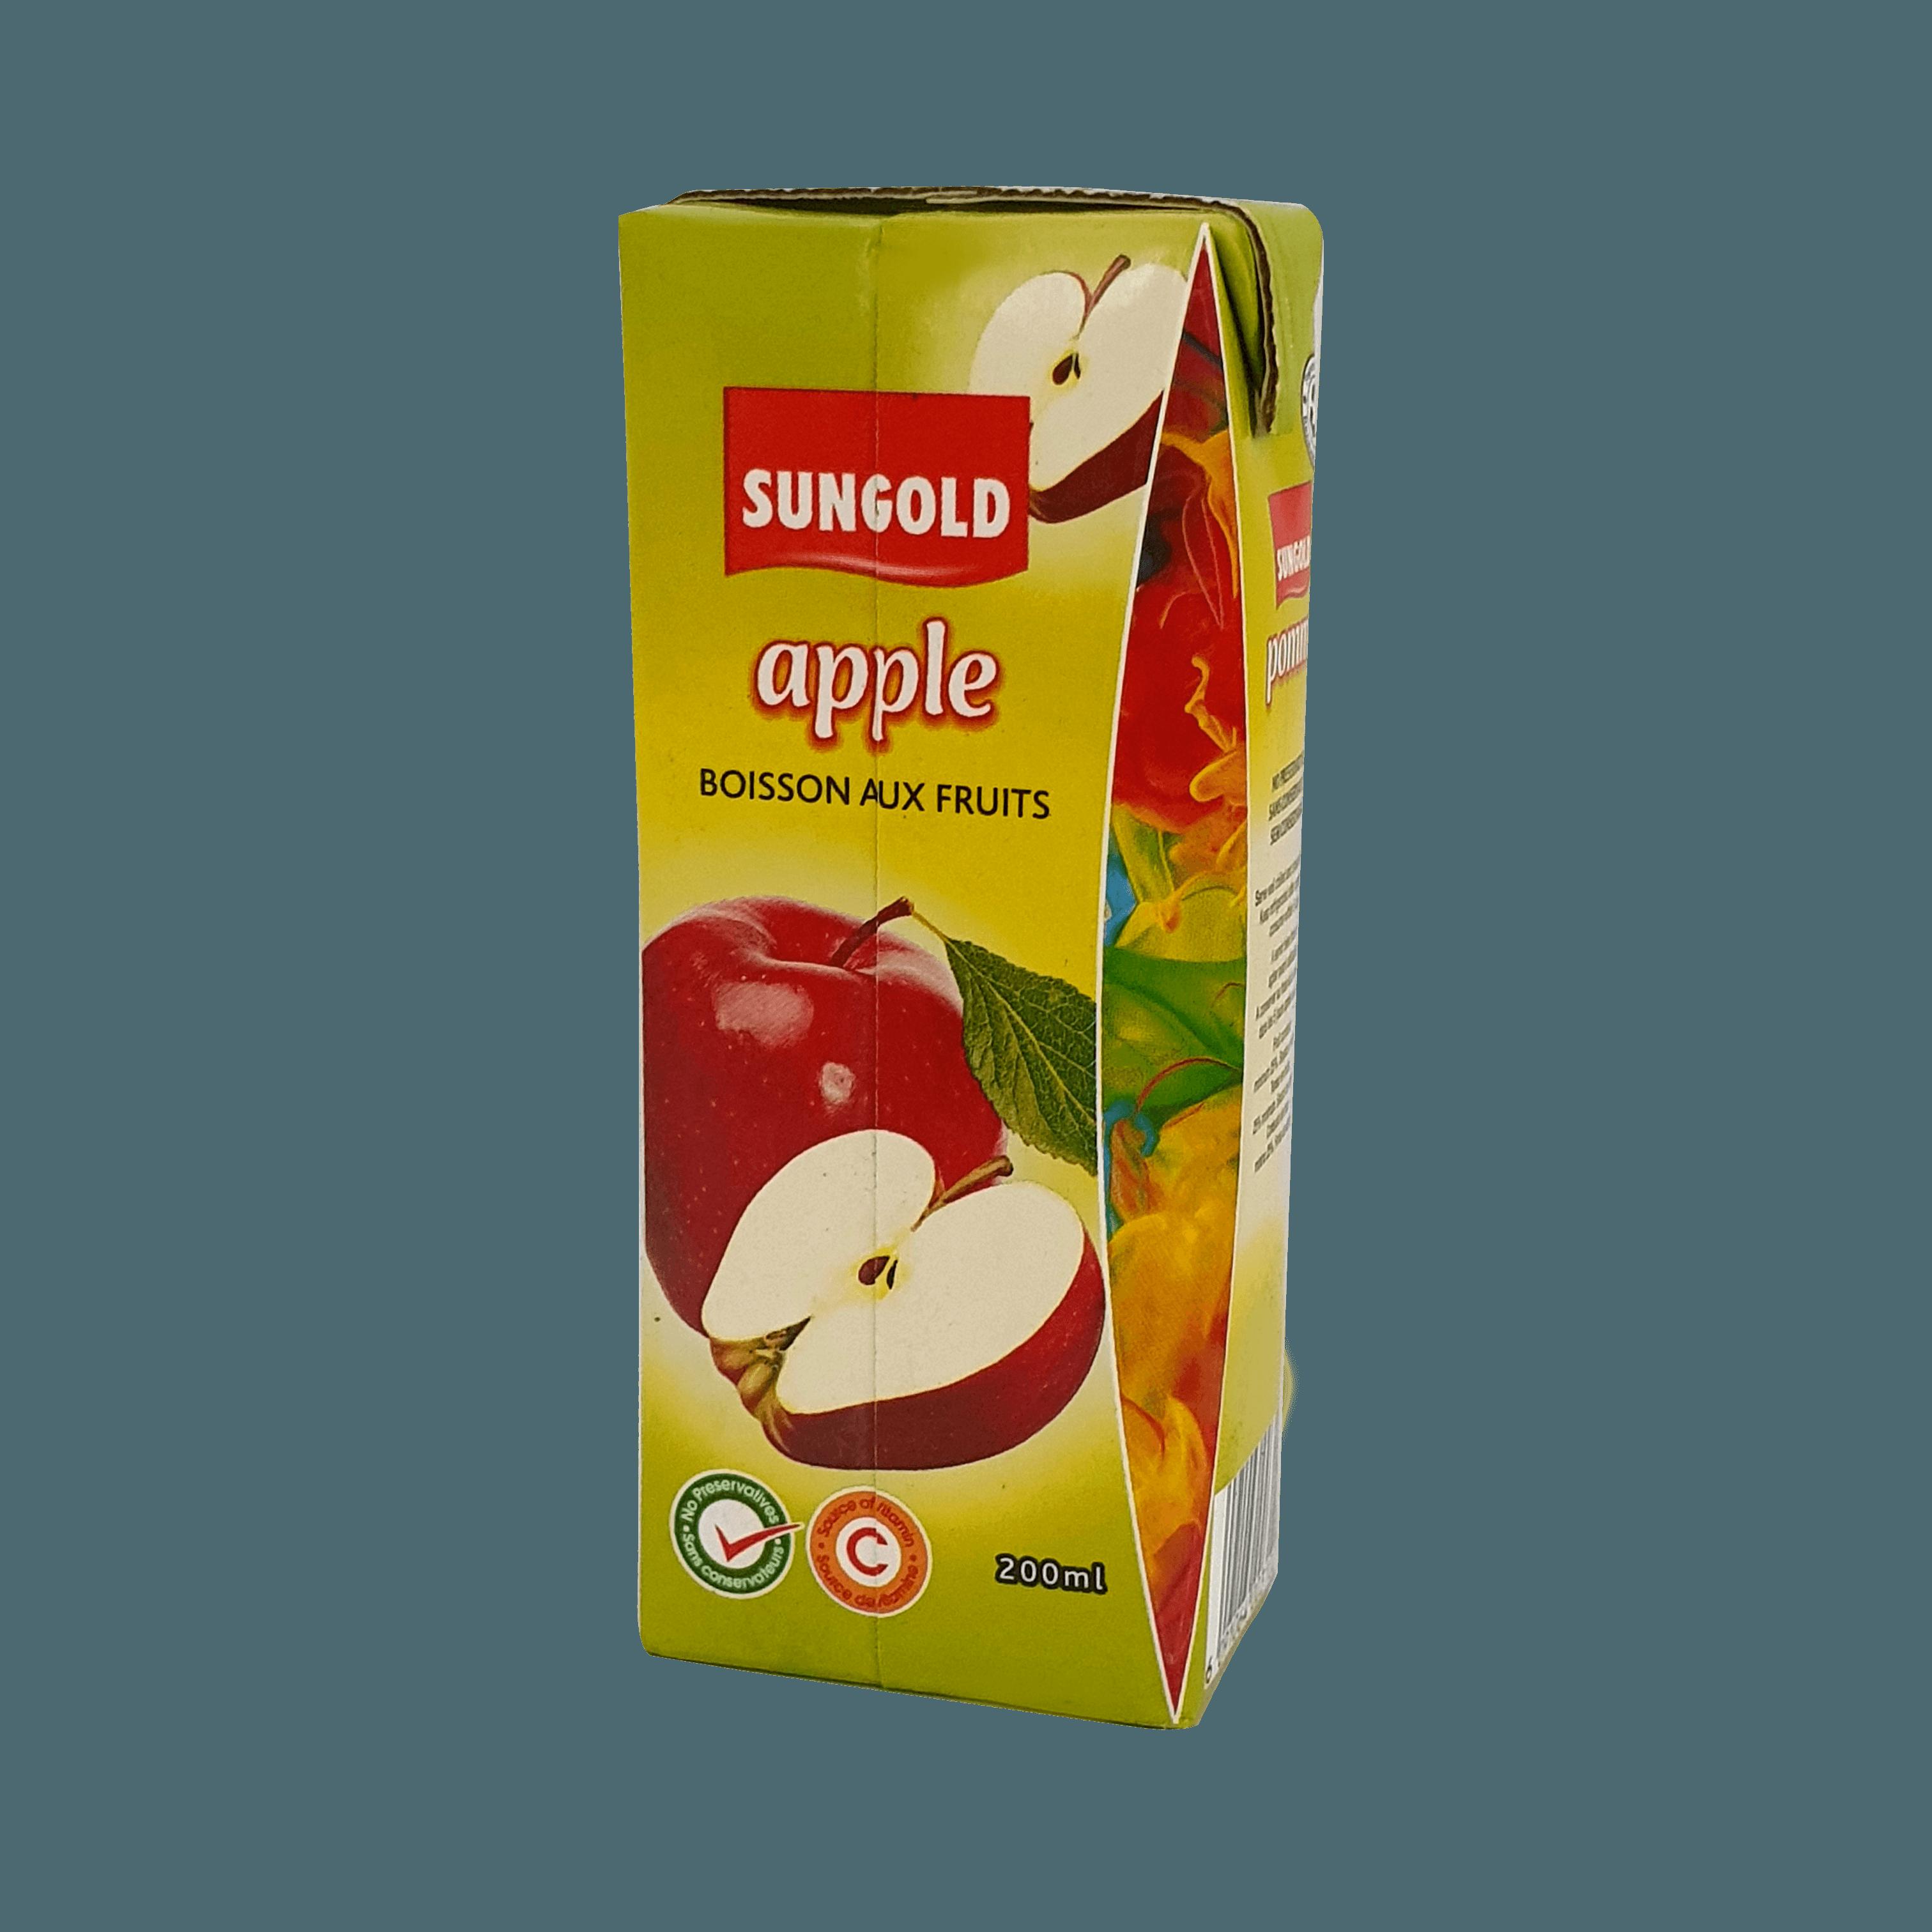 sungold-apple oct 19